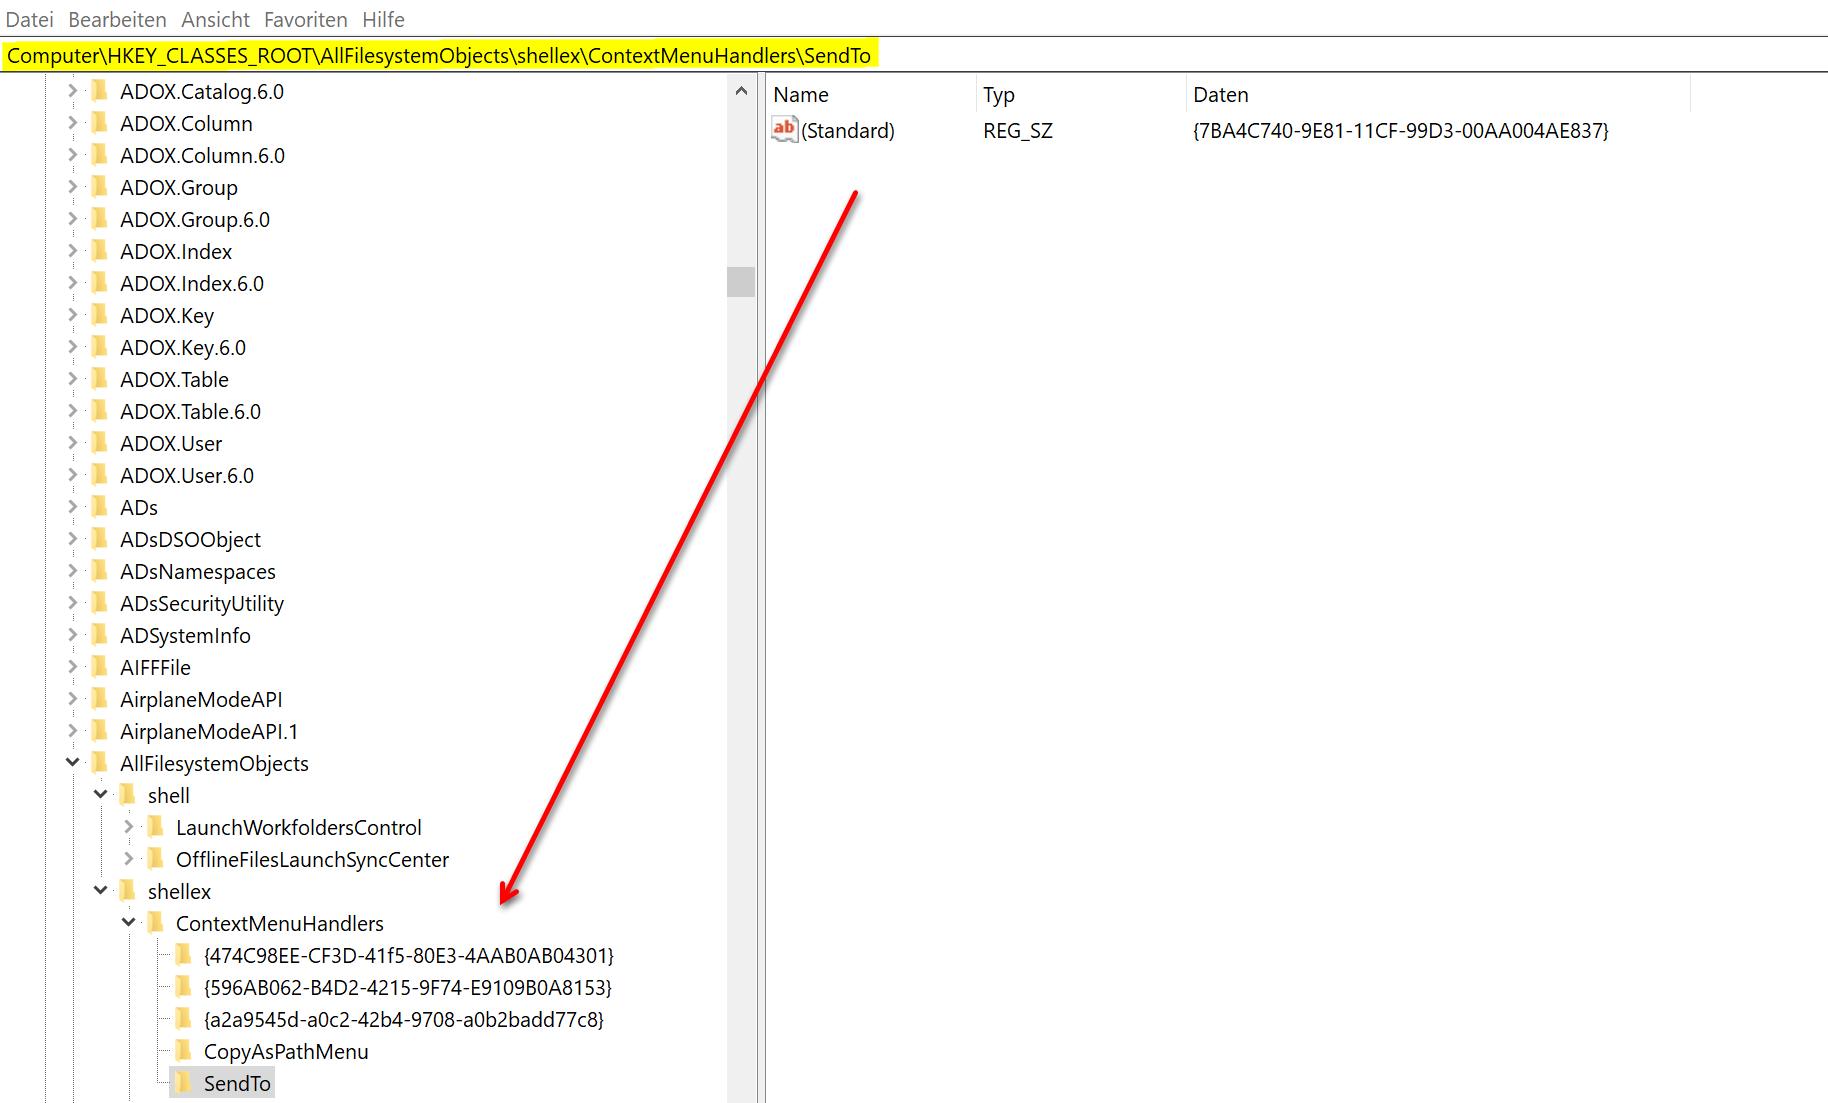 Windows 10 Registry_Kontextmenueeintraege bearbeiten